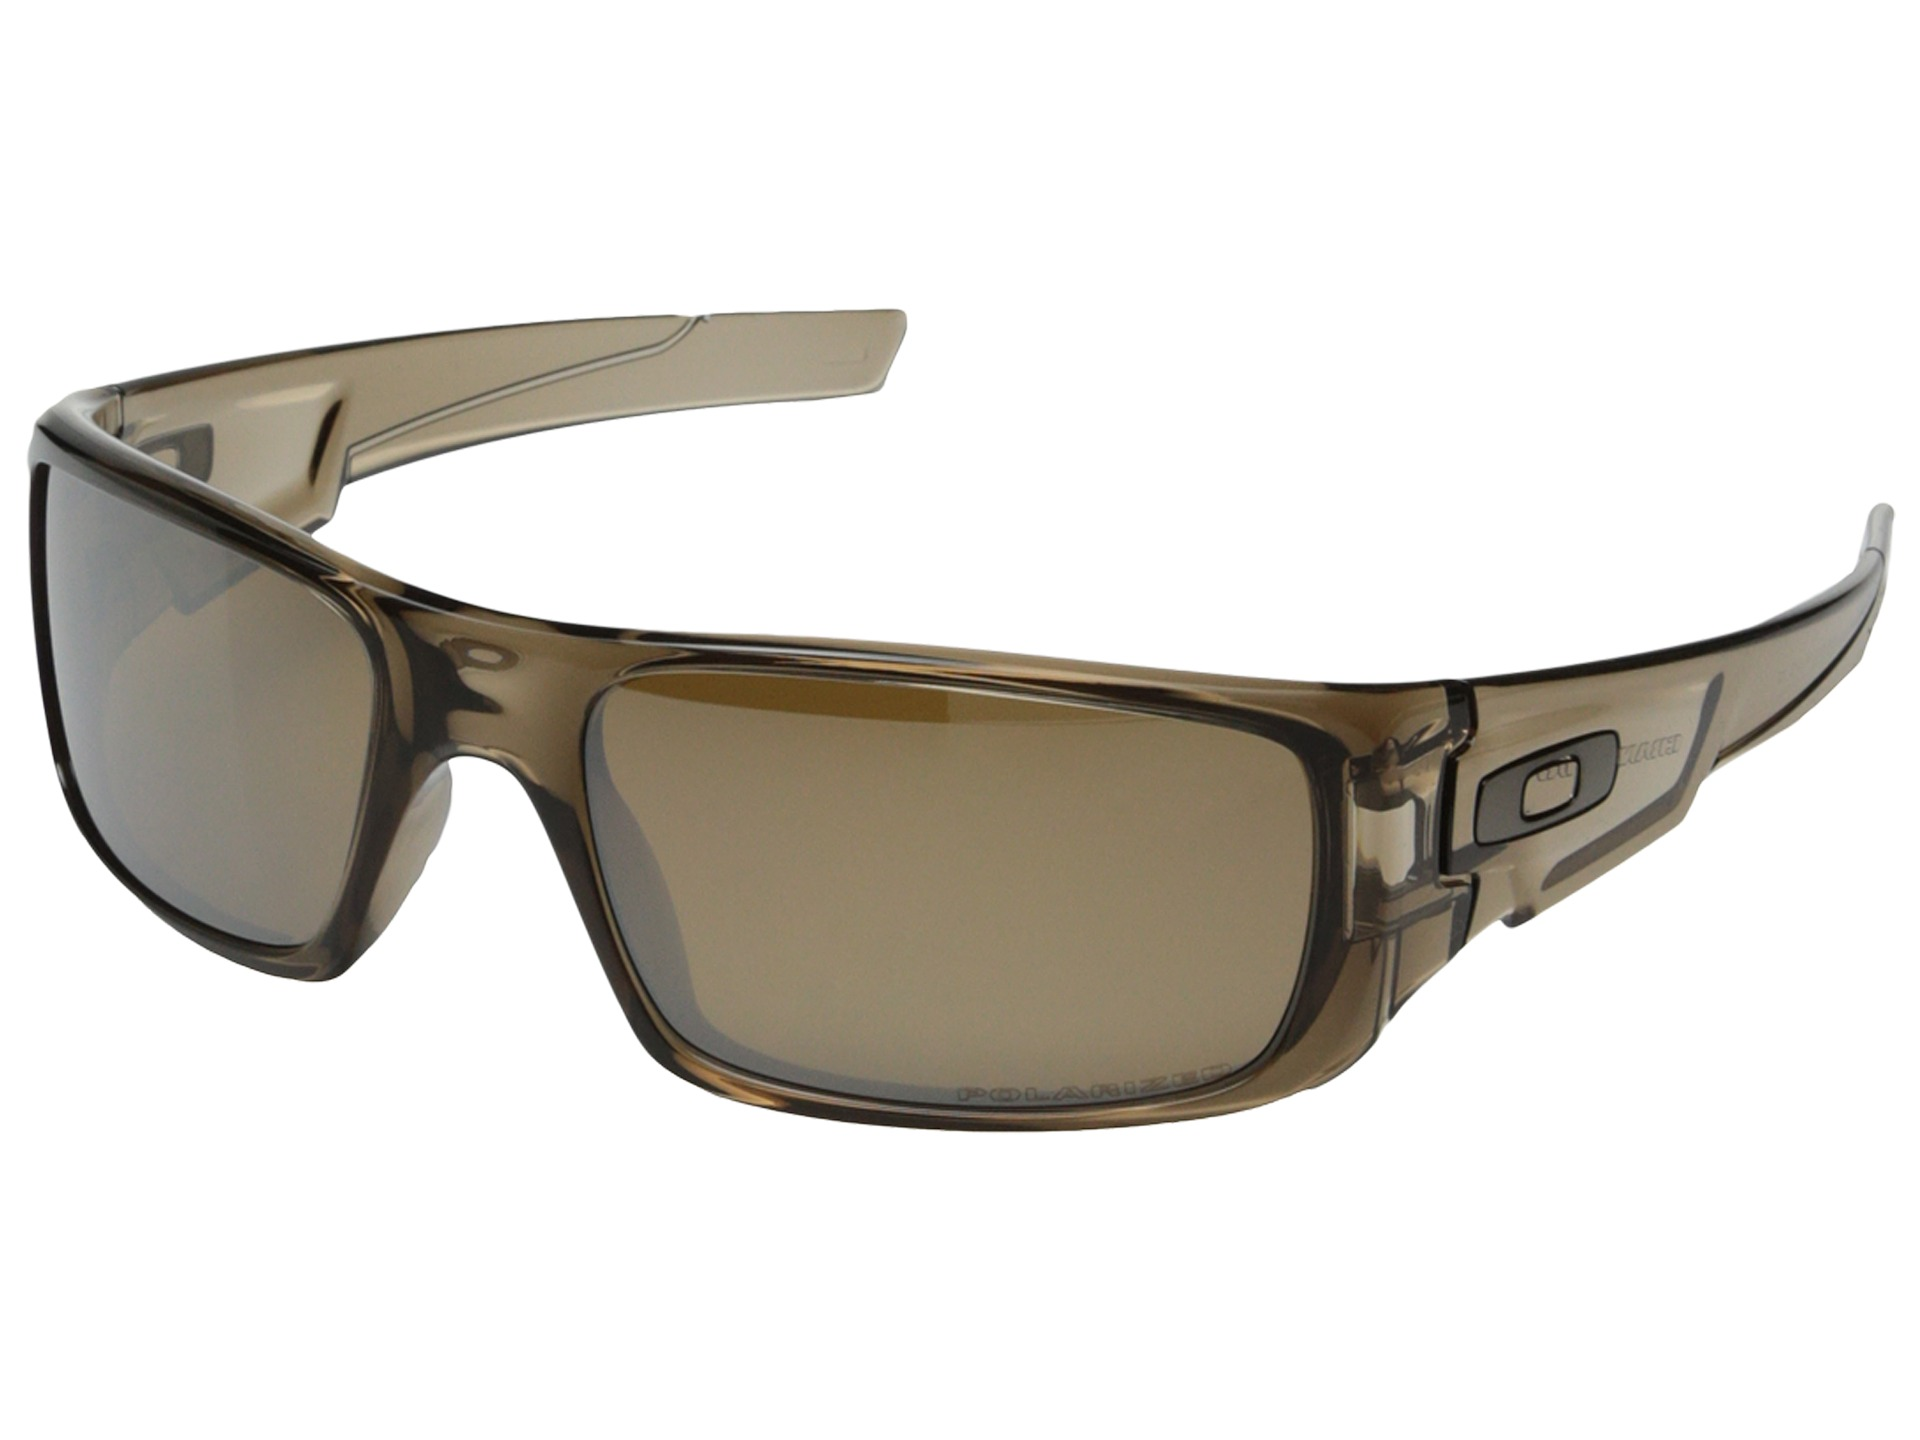 Oakley Sunglasses Las Vegas